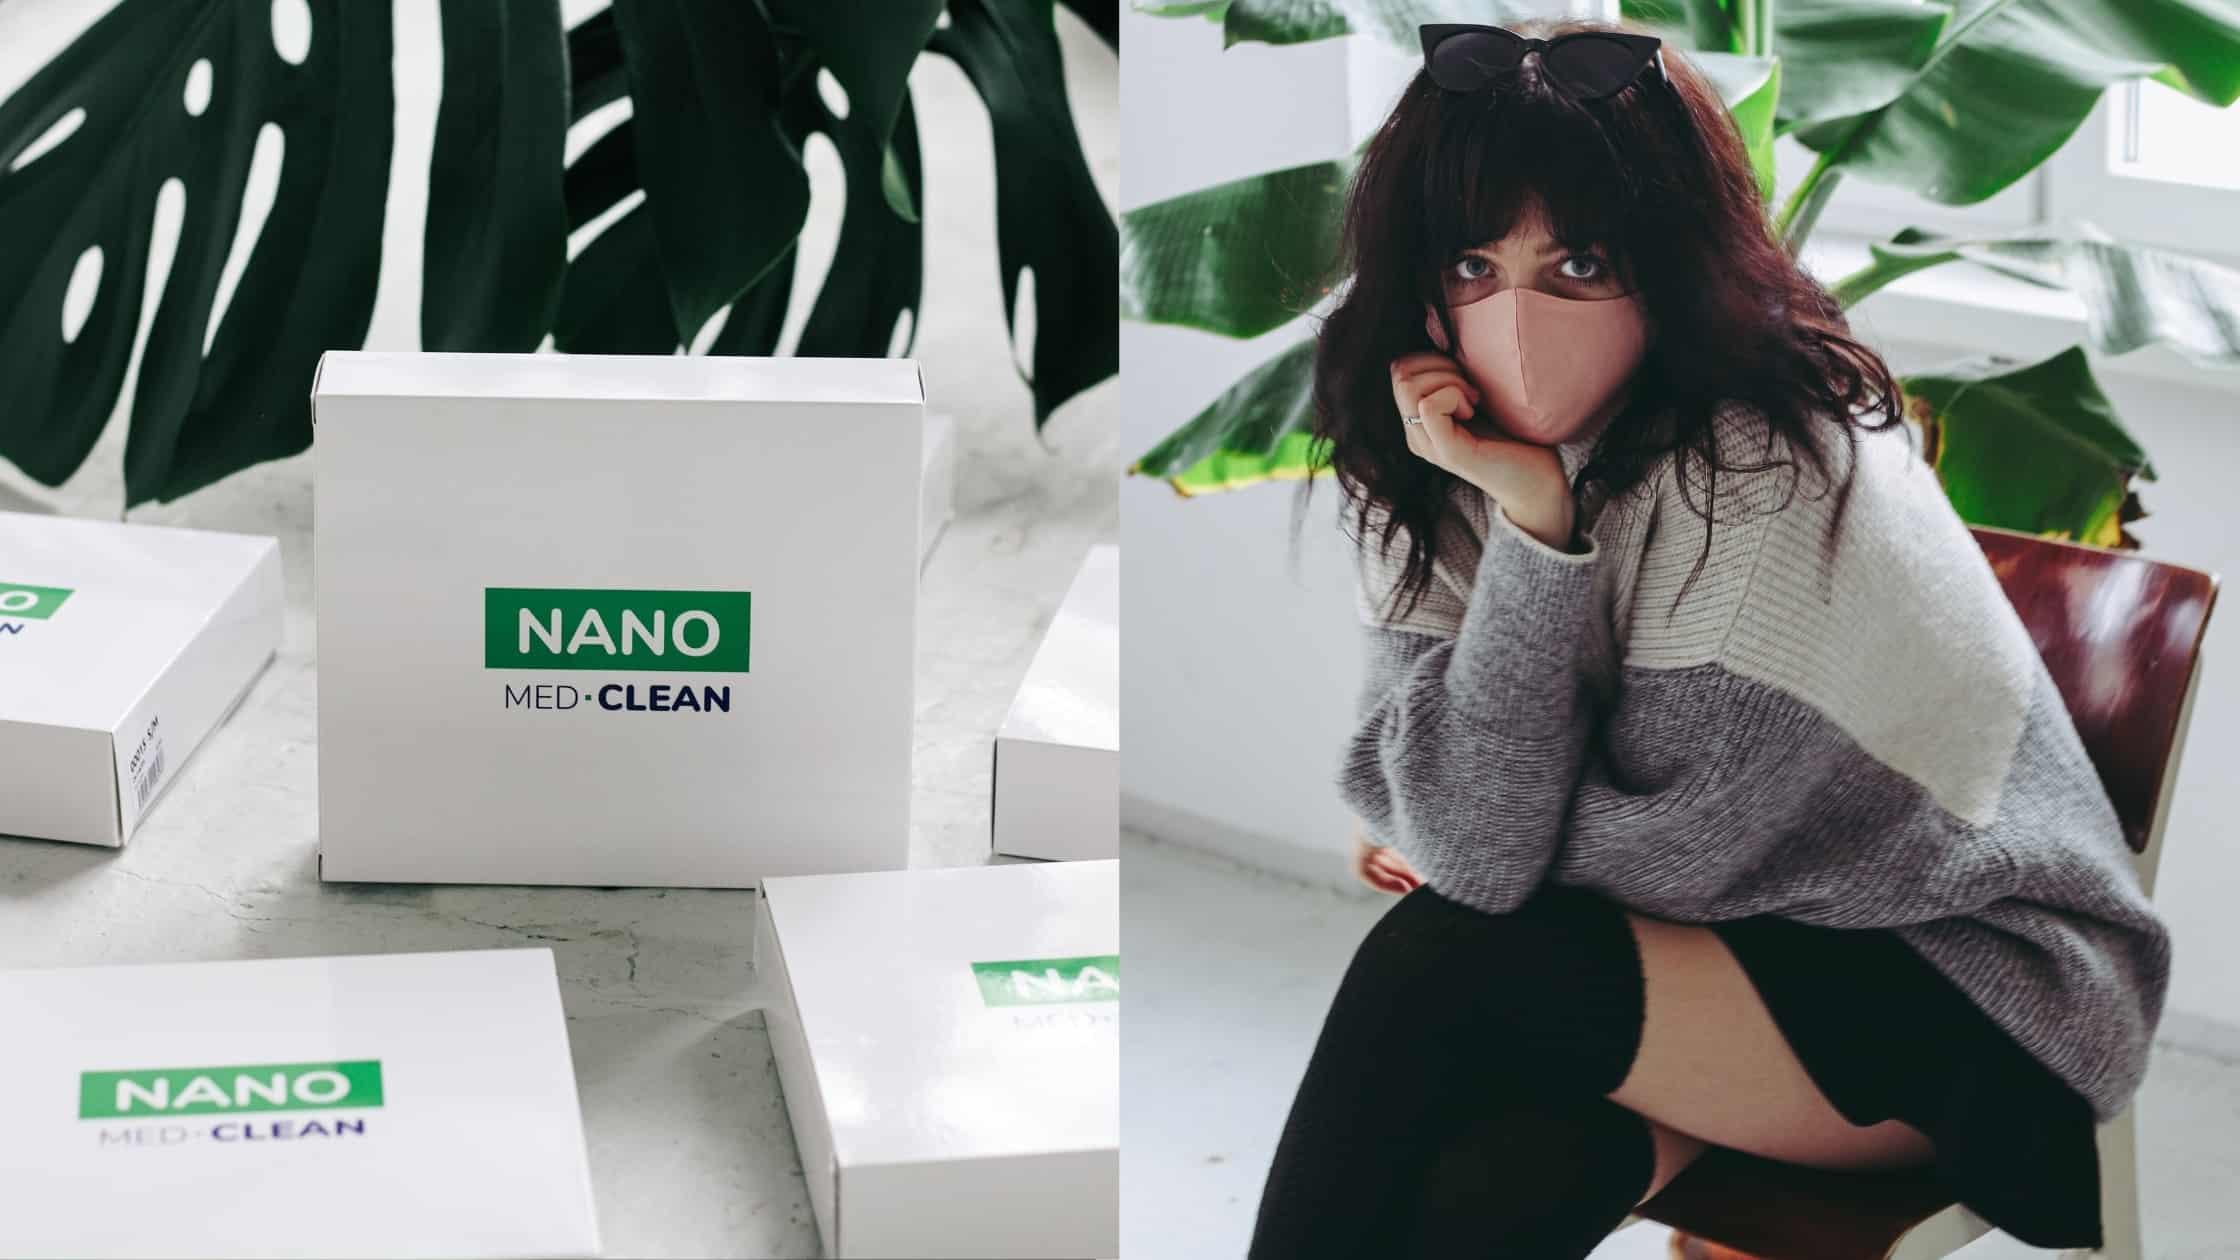 nano-med-clean-rousky